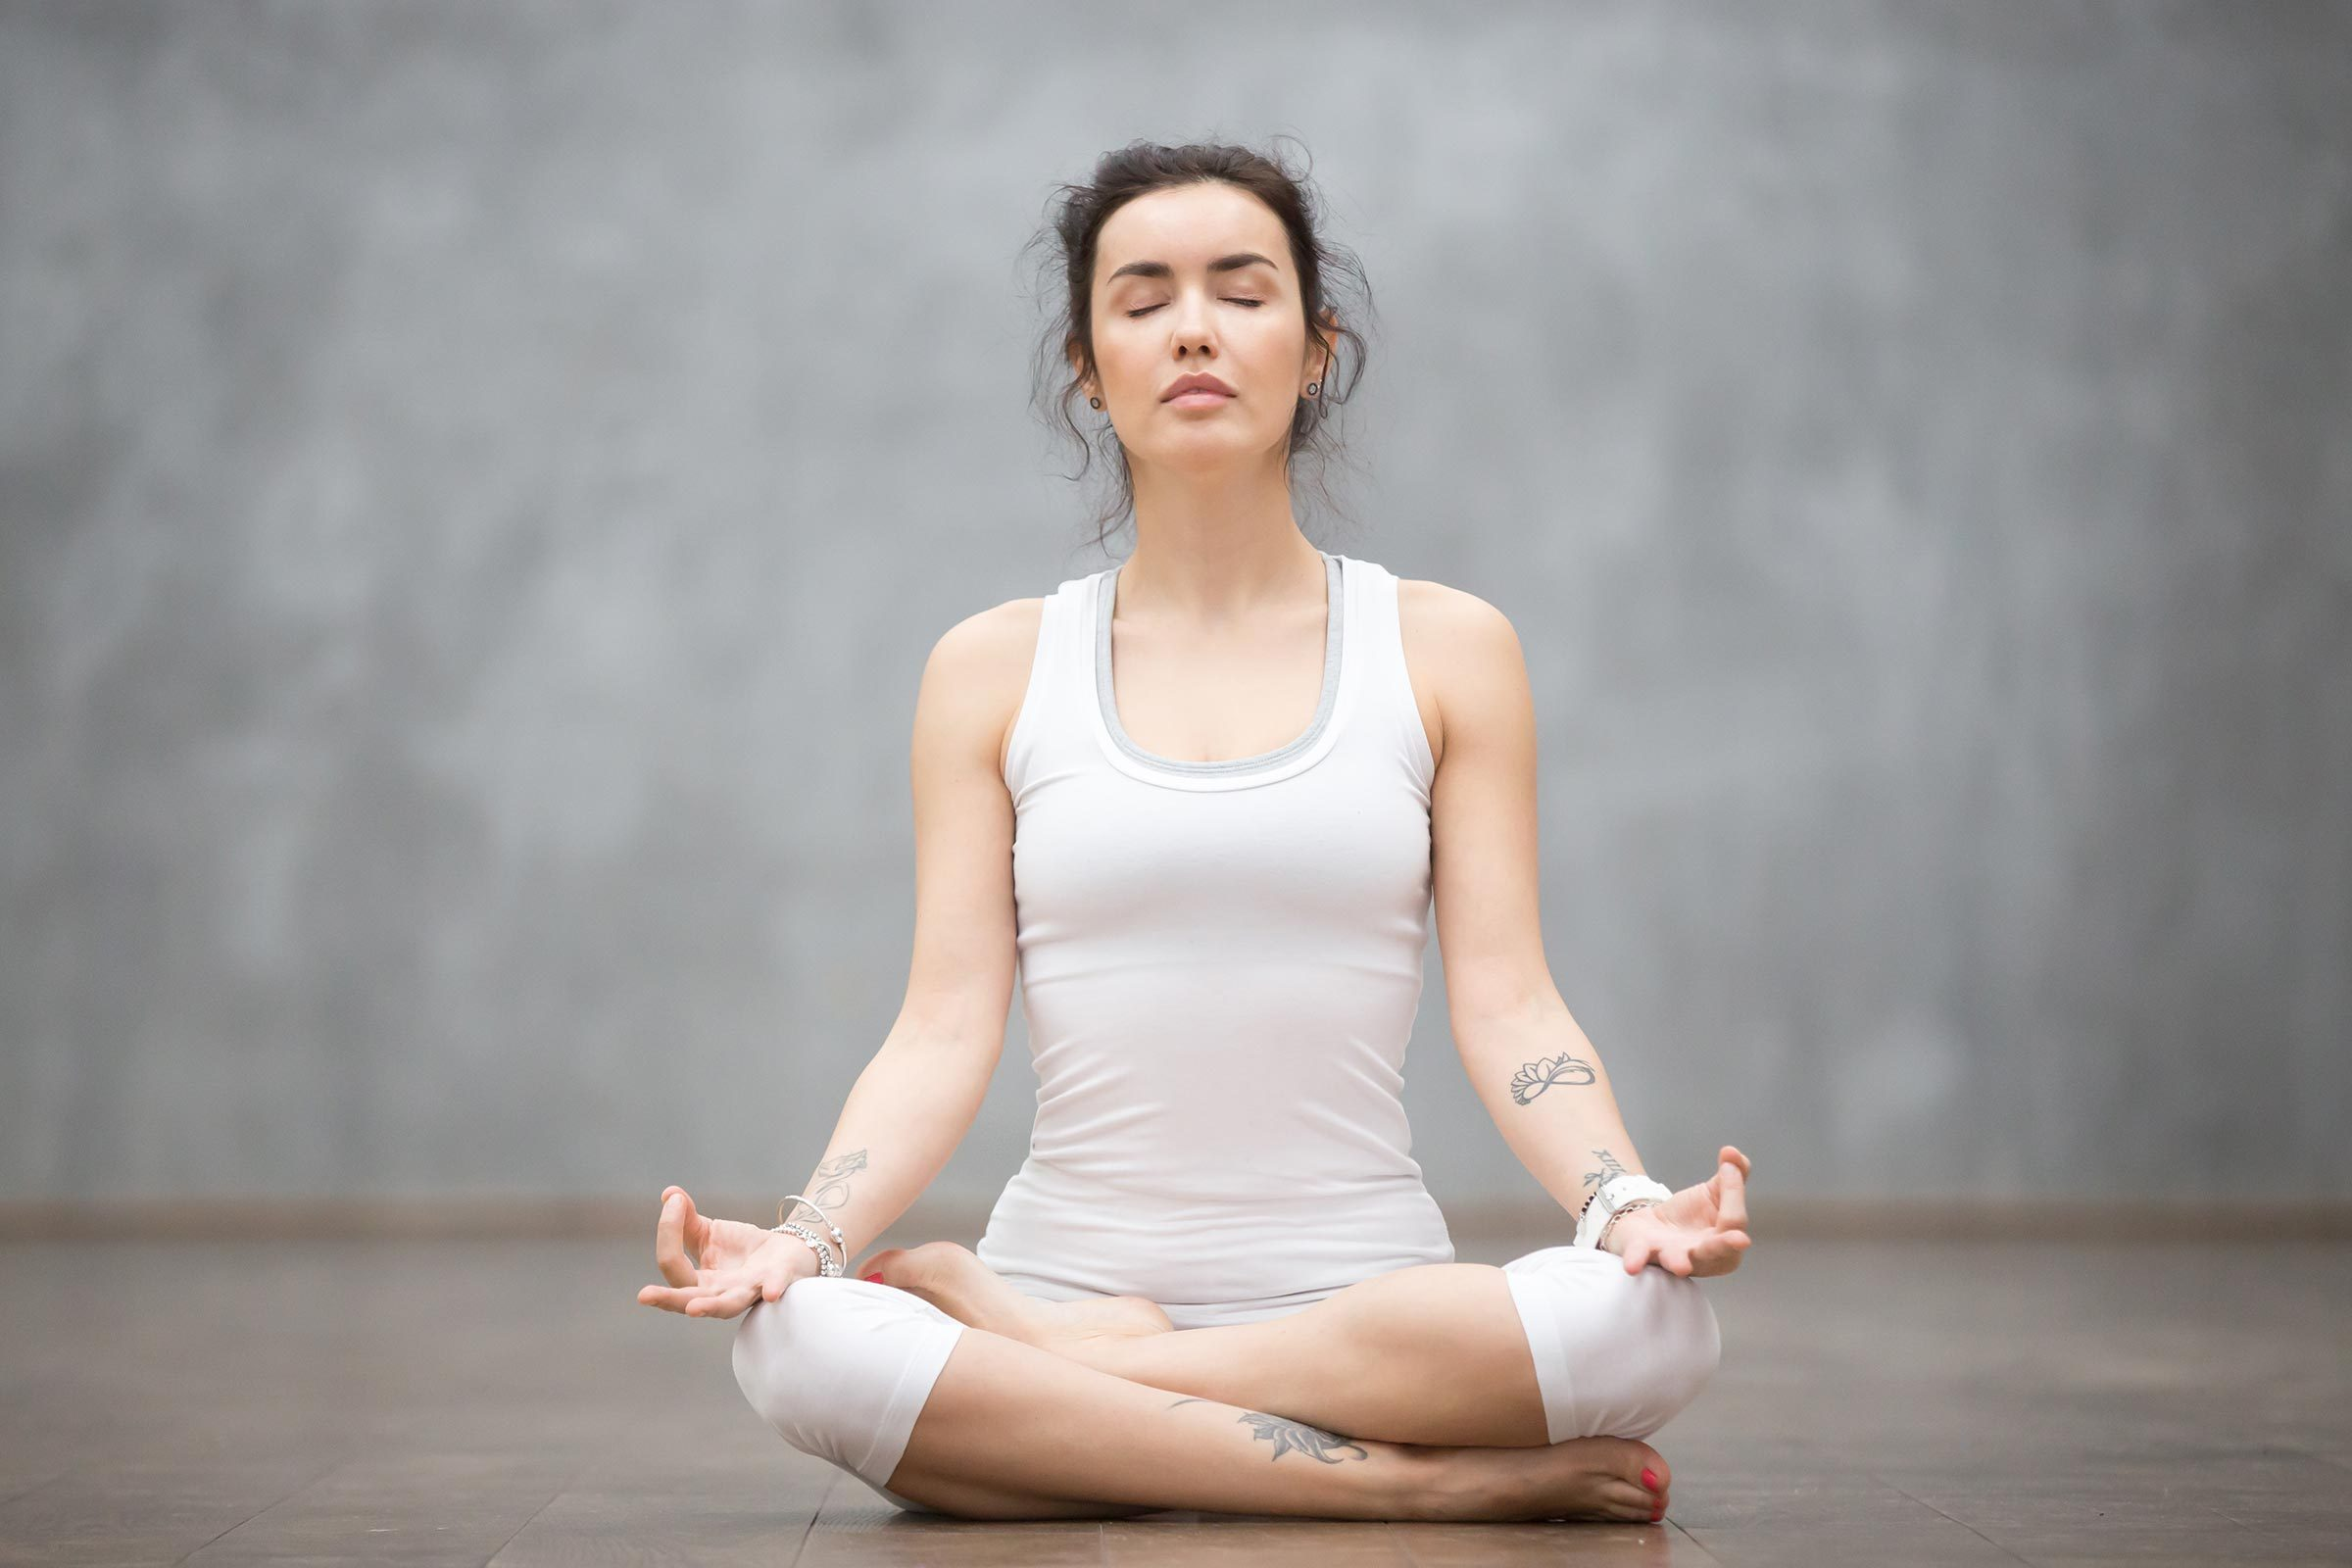 woman meditation relax